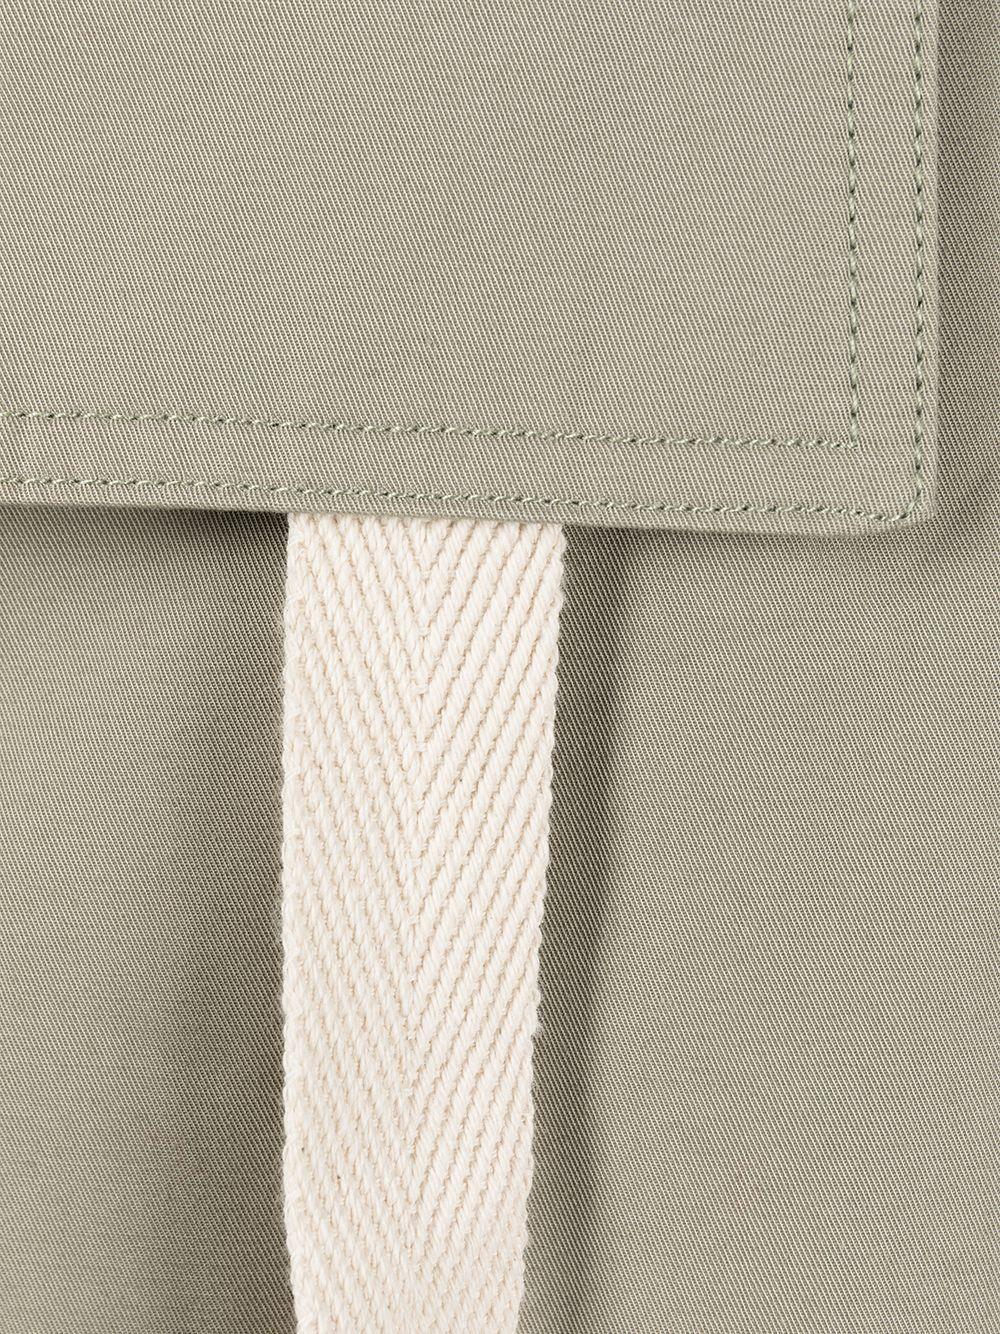 Pantaloni cargo Le pantalon Alzu in cotone verde e panna con due tasche cargo laterali JACQUEMUS | Pantaloni | 215PA04-101530